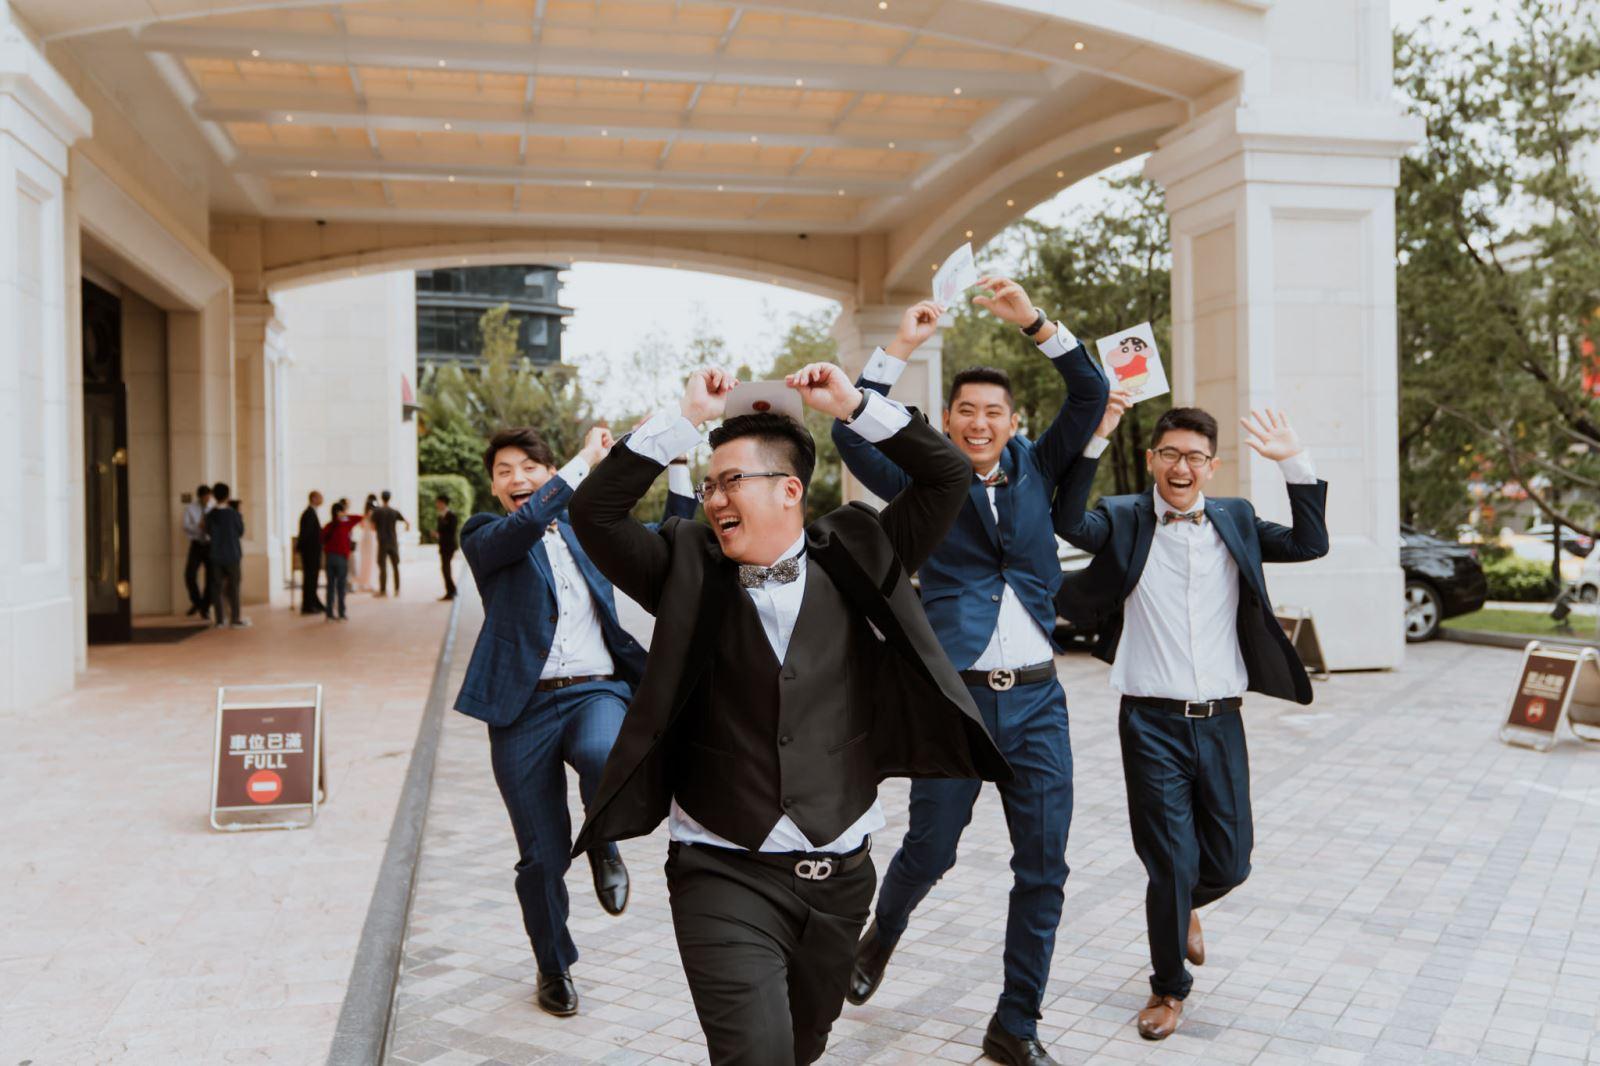 TWO in ONE婚禮顧問策劃新郎與伴郎闖關.奔跑的男生